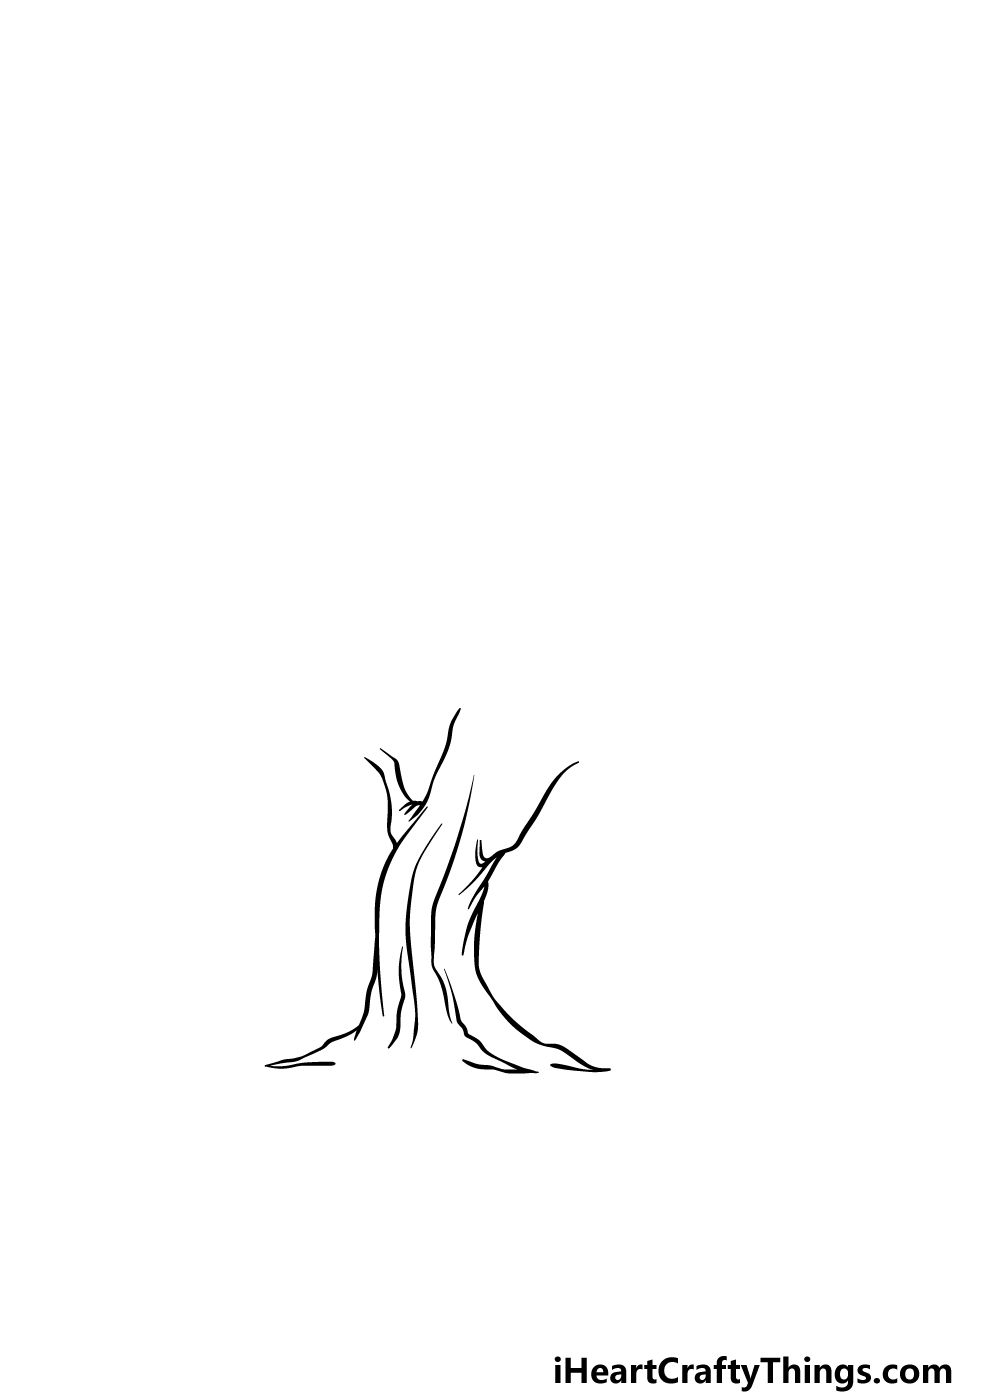 drawing an oak tree step 2